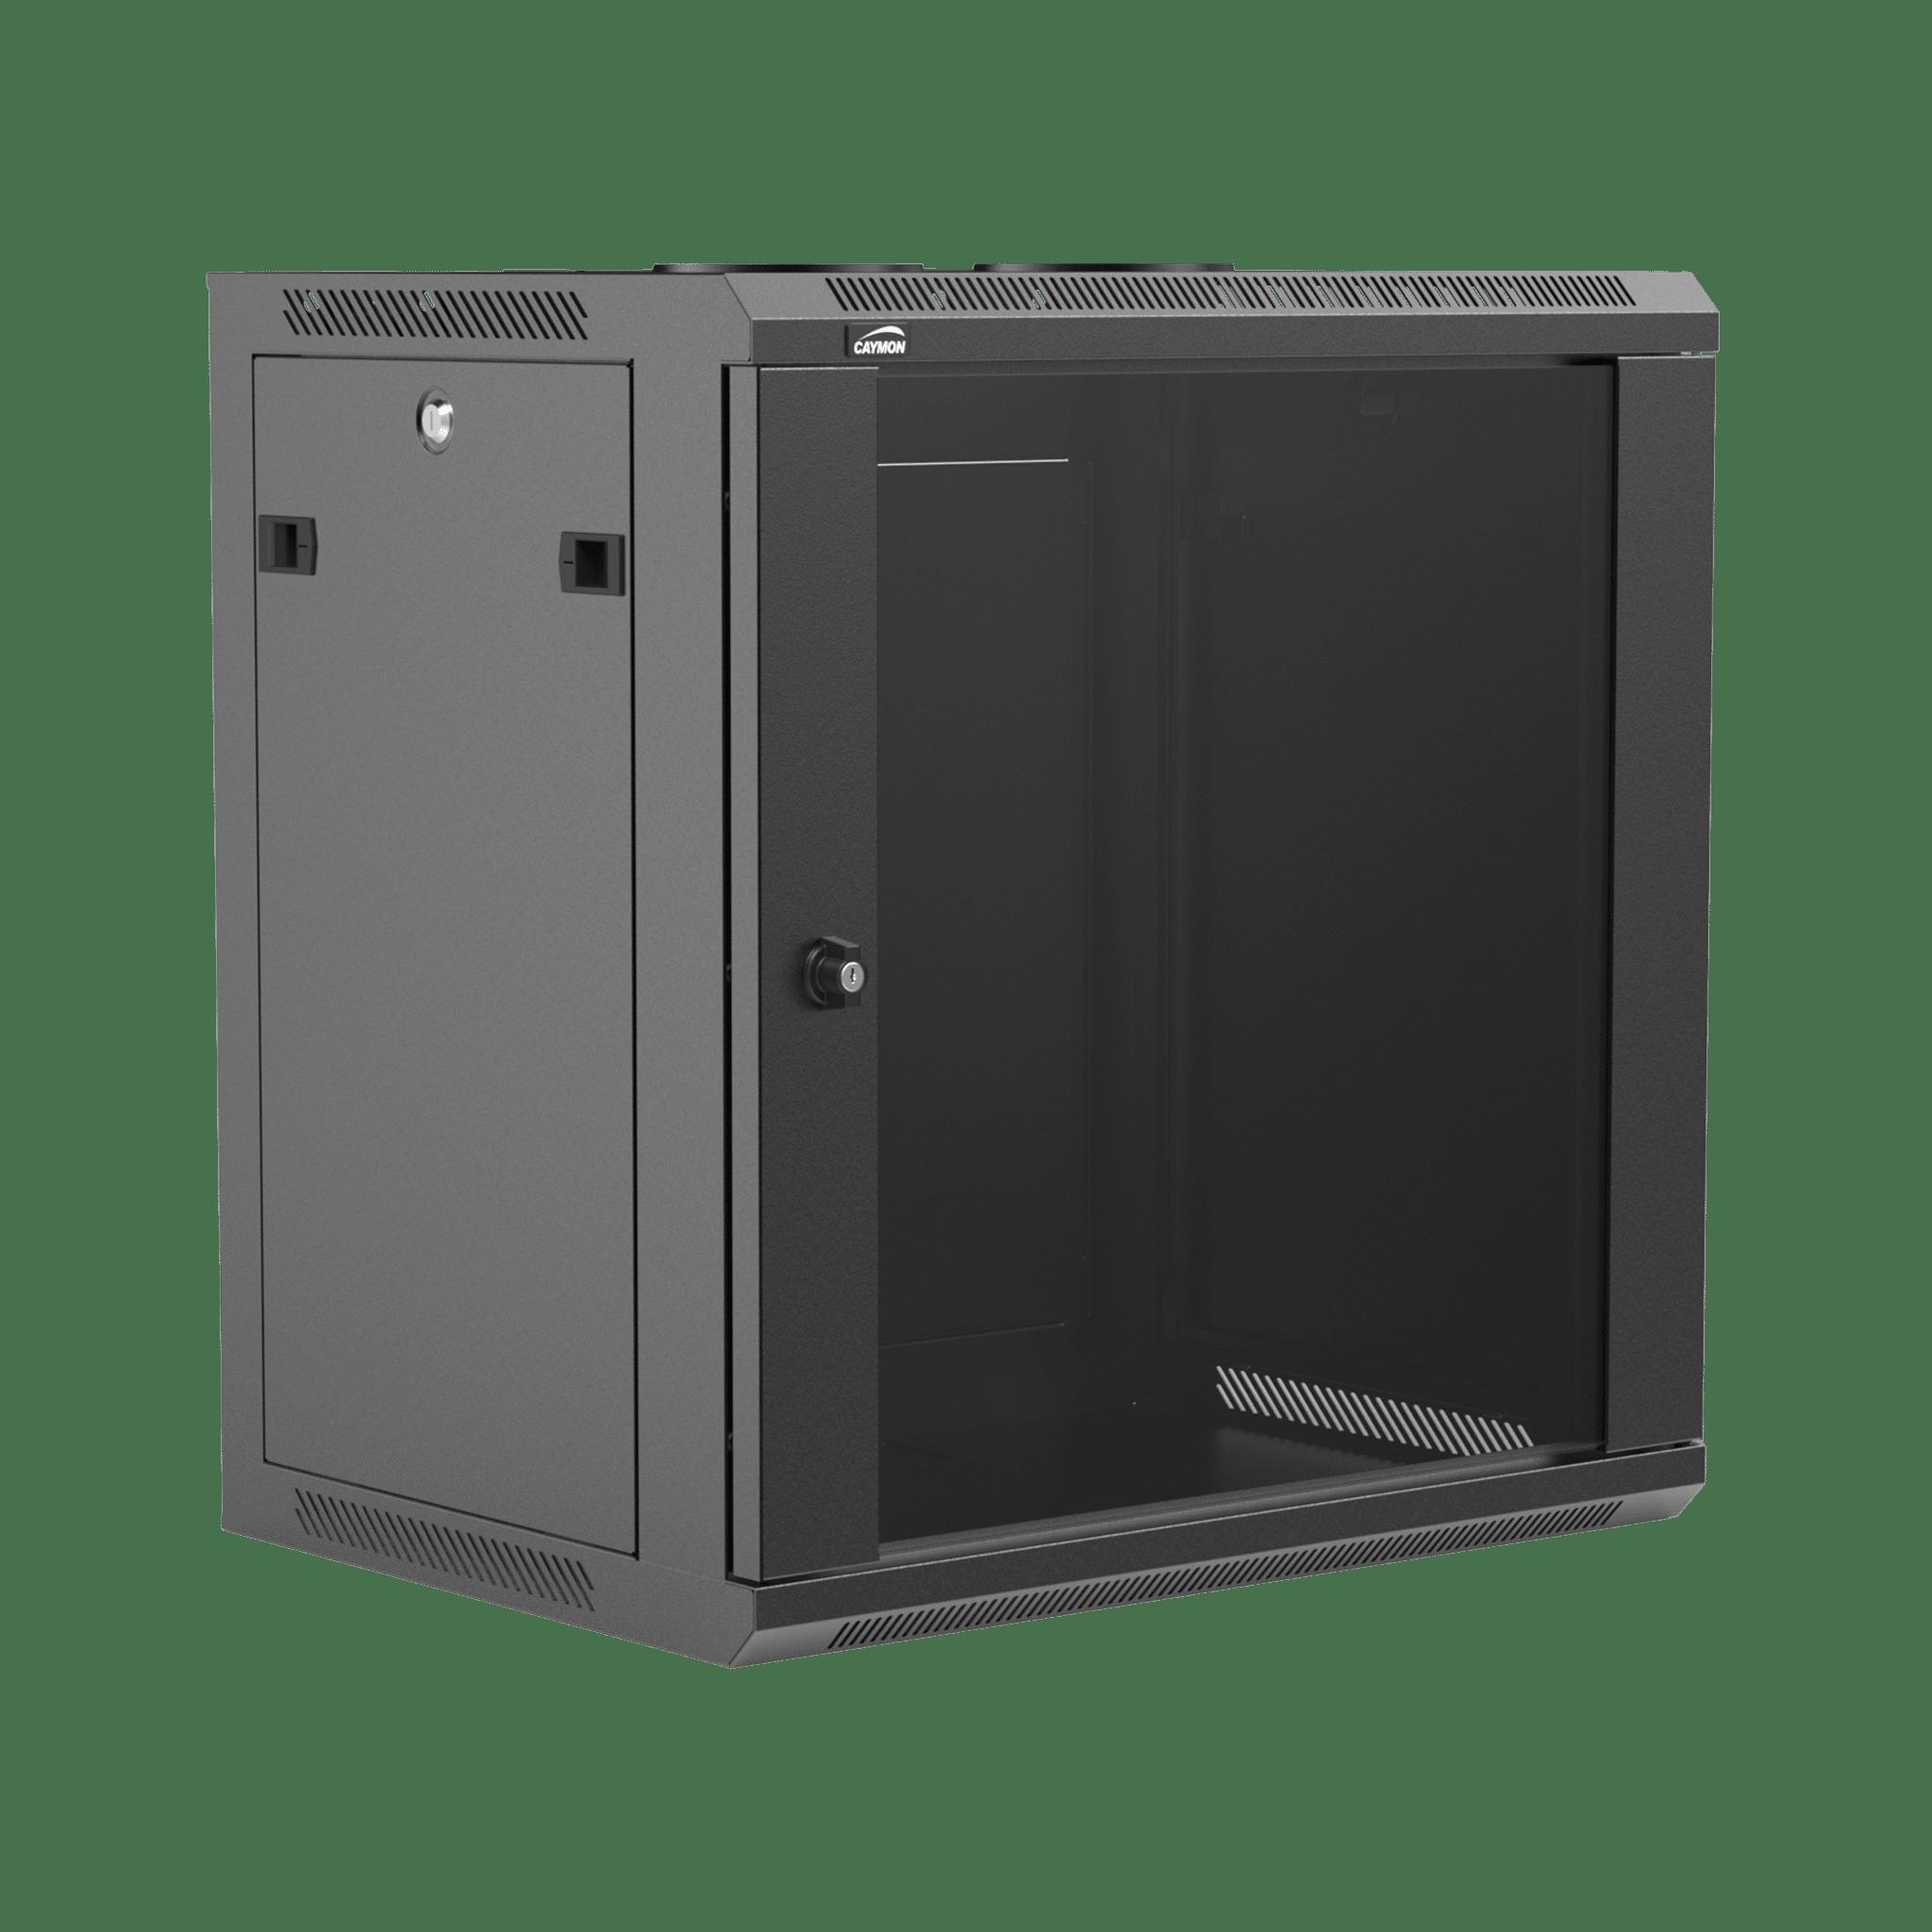 "WPR412R - 19"" wall mount rack - 12 units - 450mm depth - Removable back"